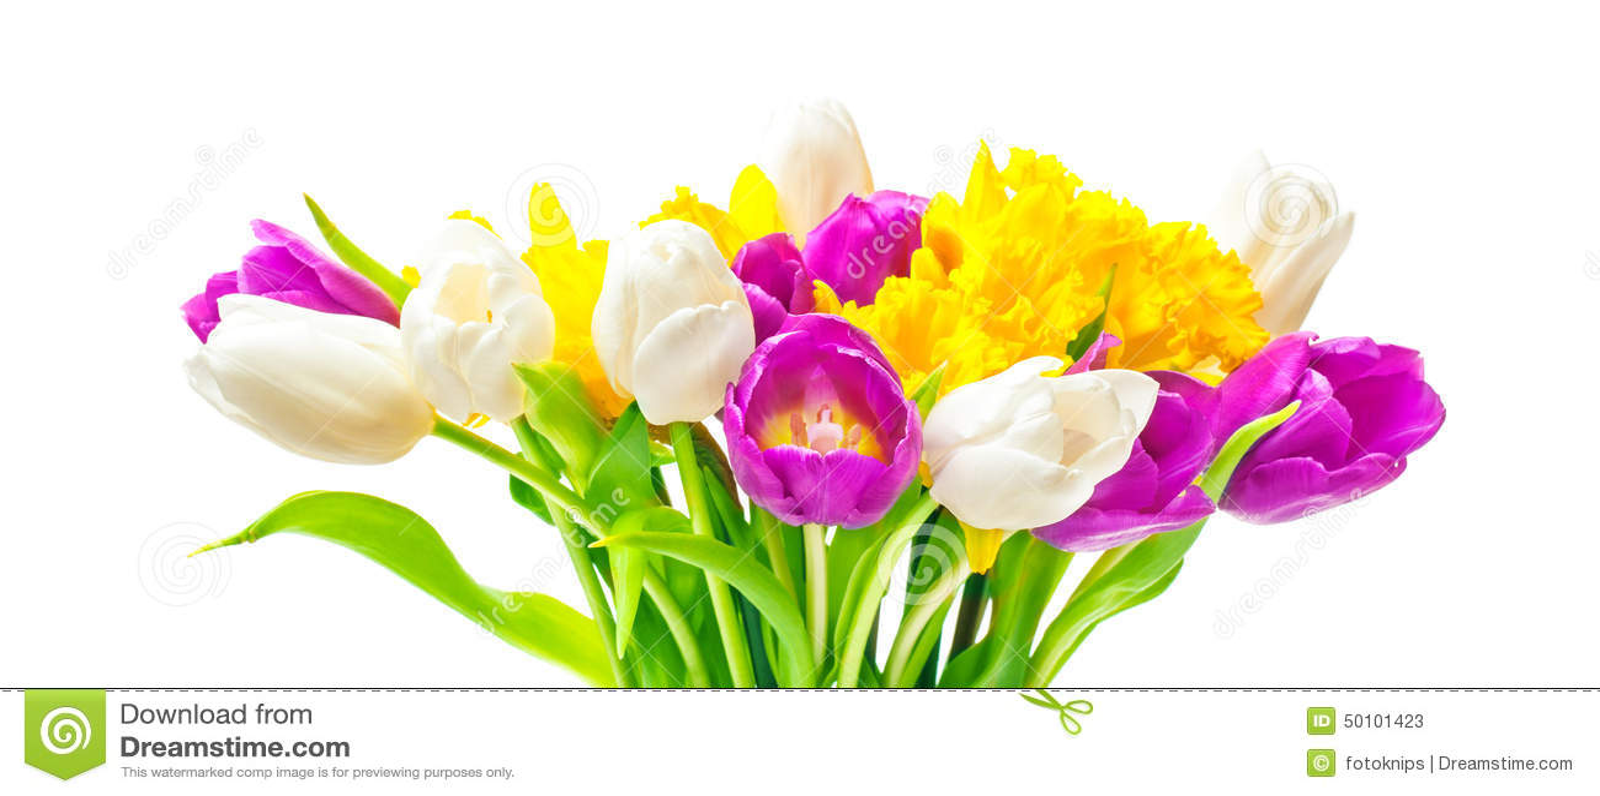 Daffodils, τουλίπες, ανθοδέσμη Πάσχας